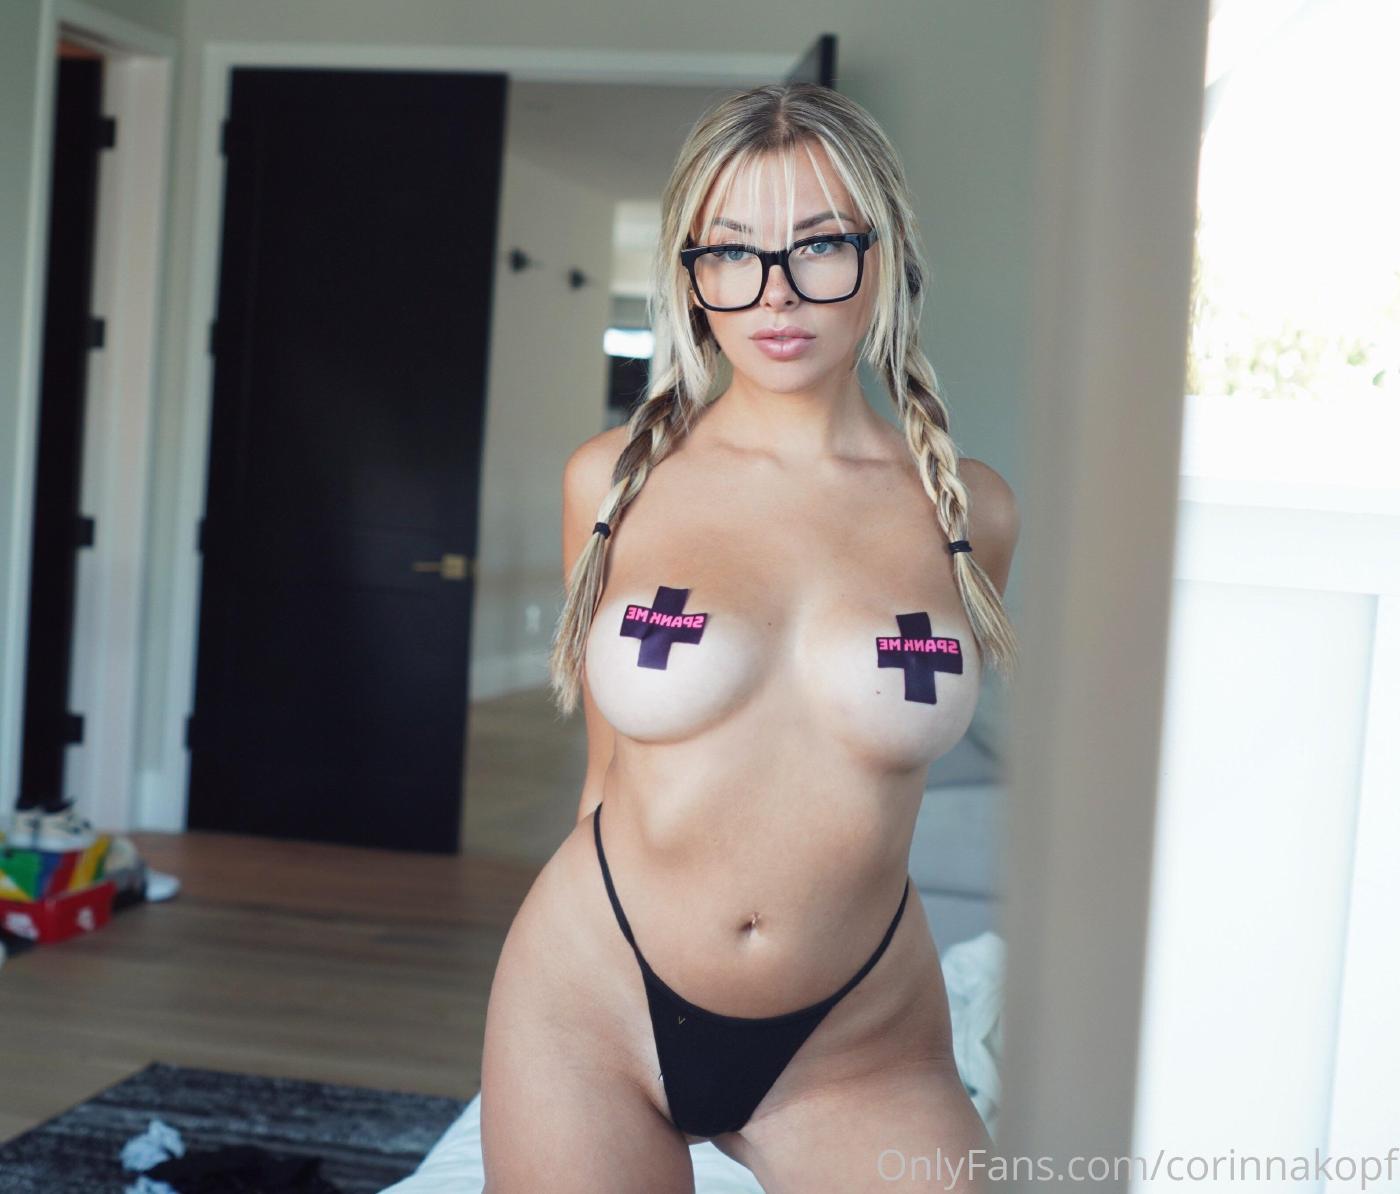 Corinna Kopf Nude Lingerie Onlyfans Set Leaked Bxvfhb